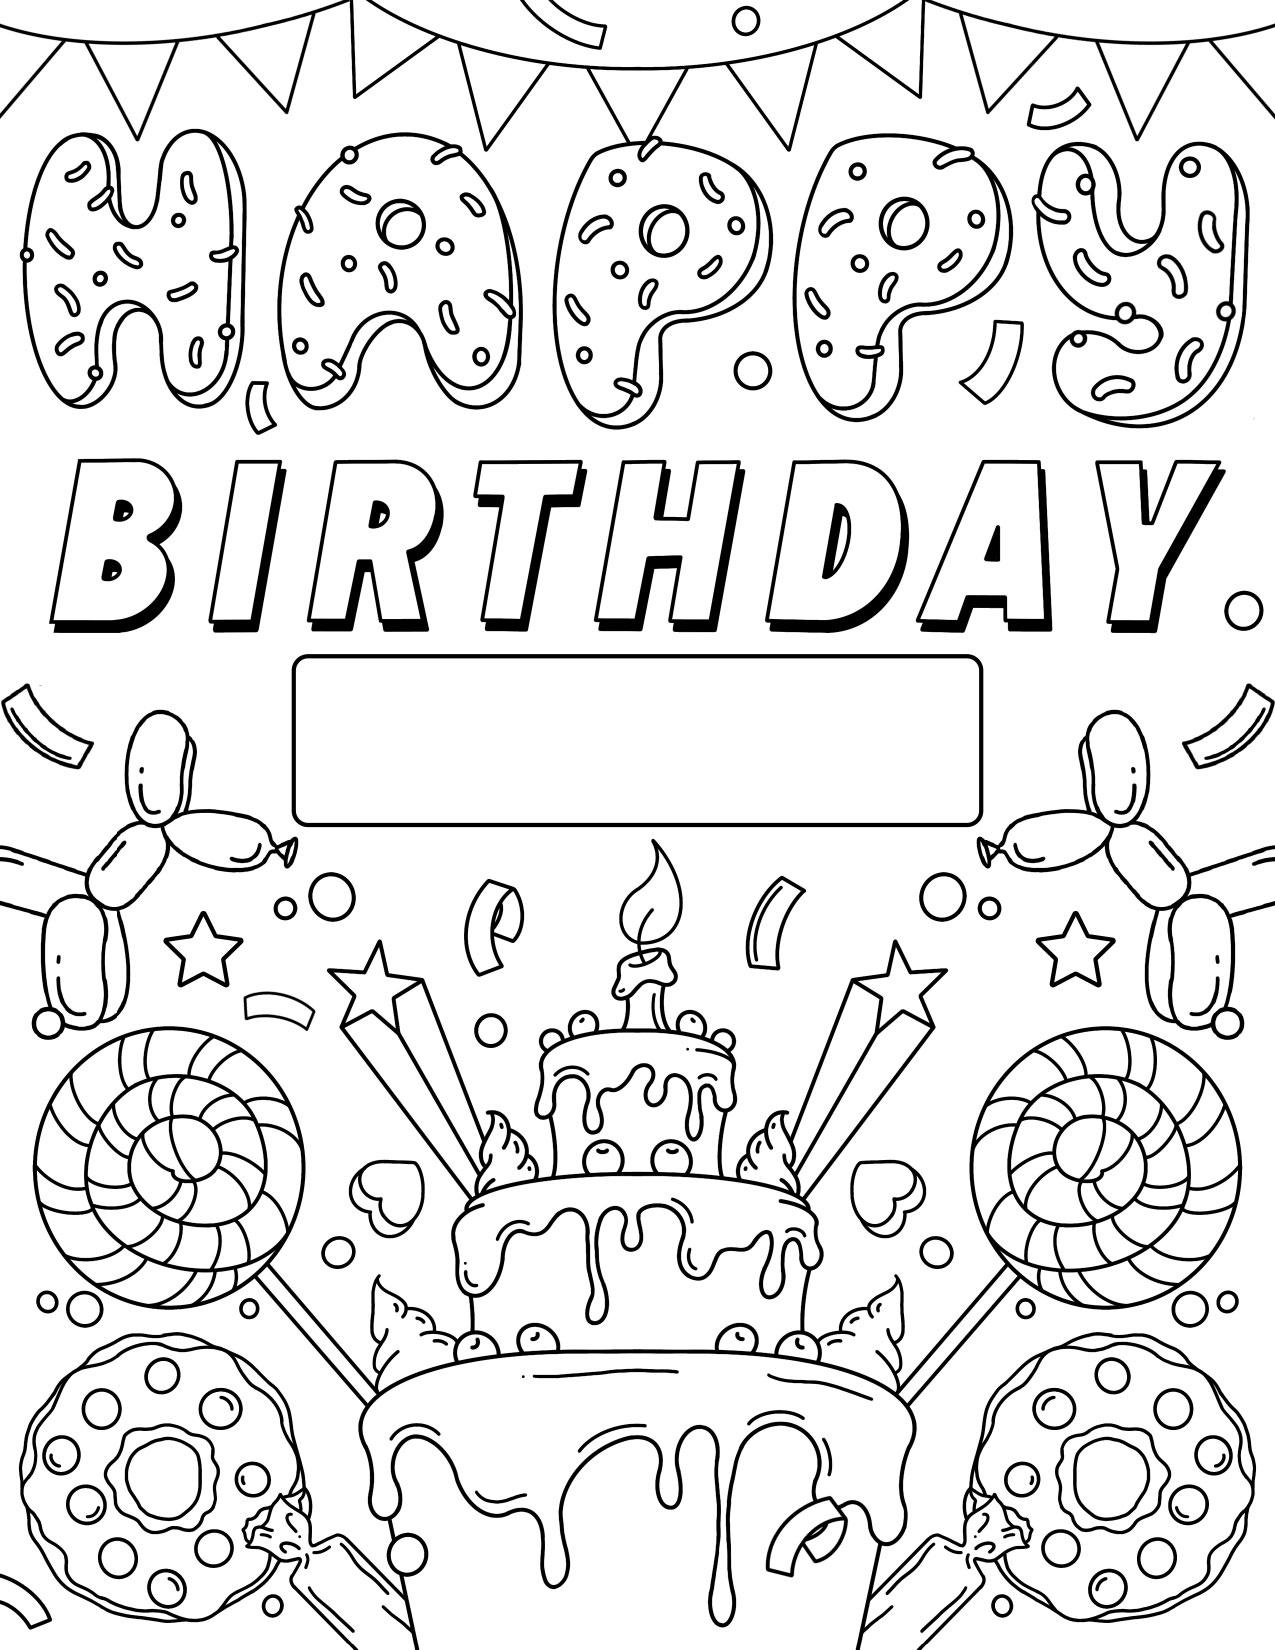 - Happy Birthday Sign Crayola.com